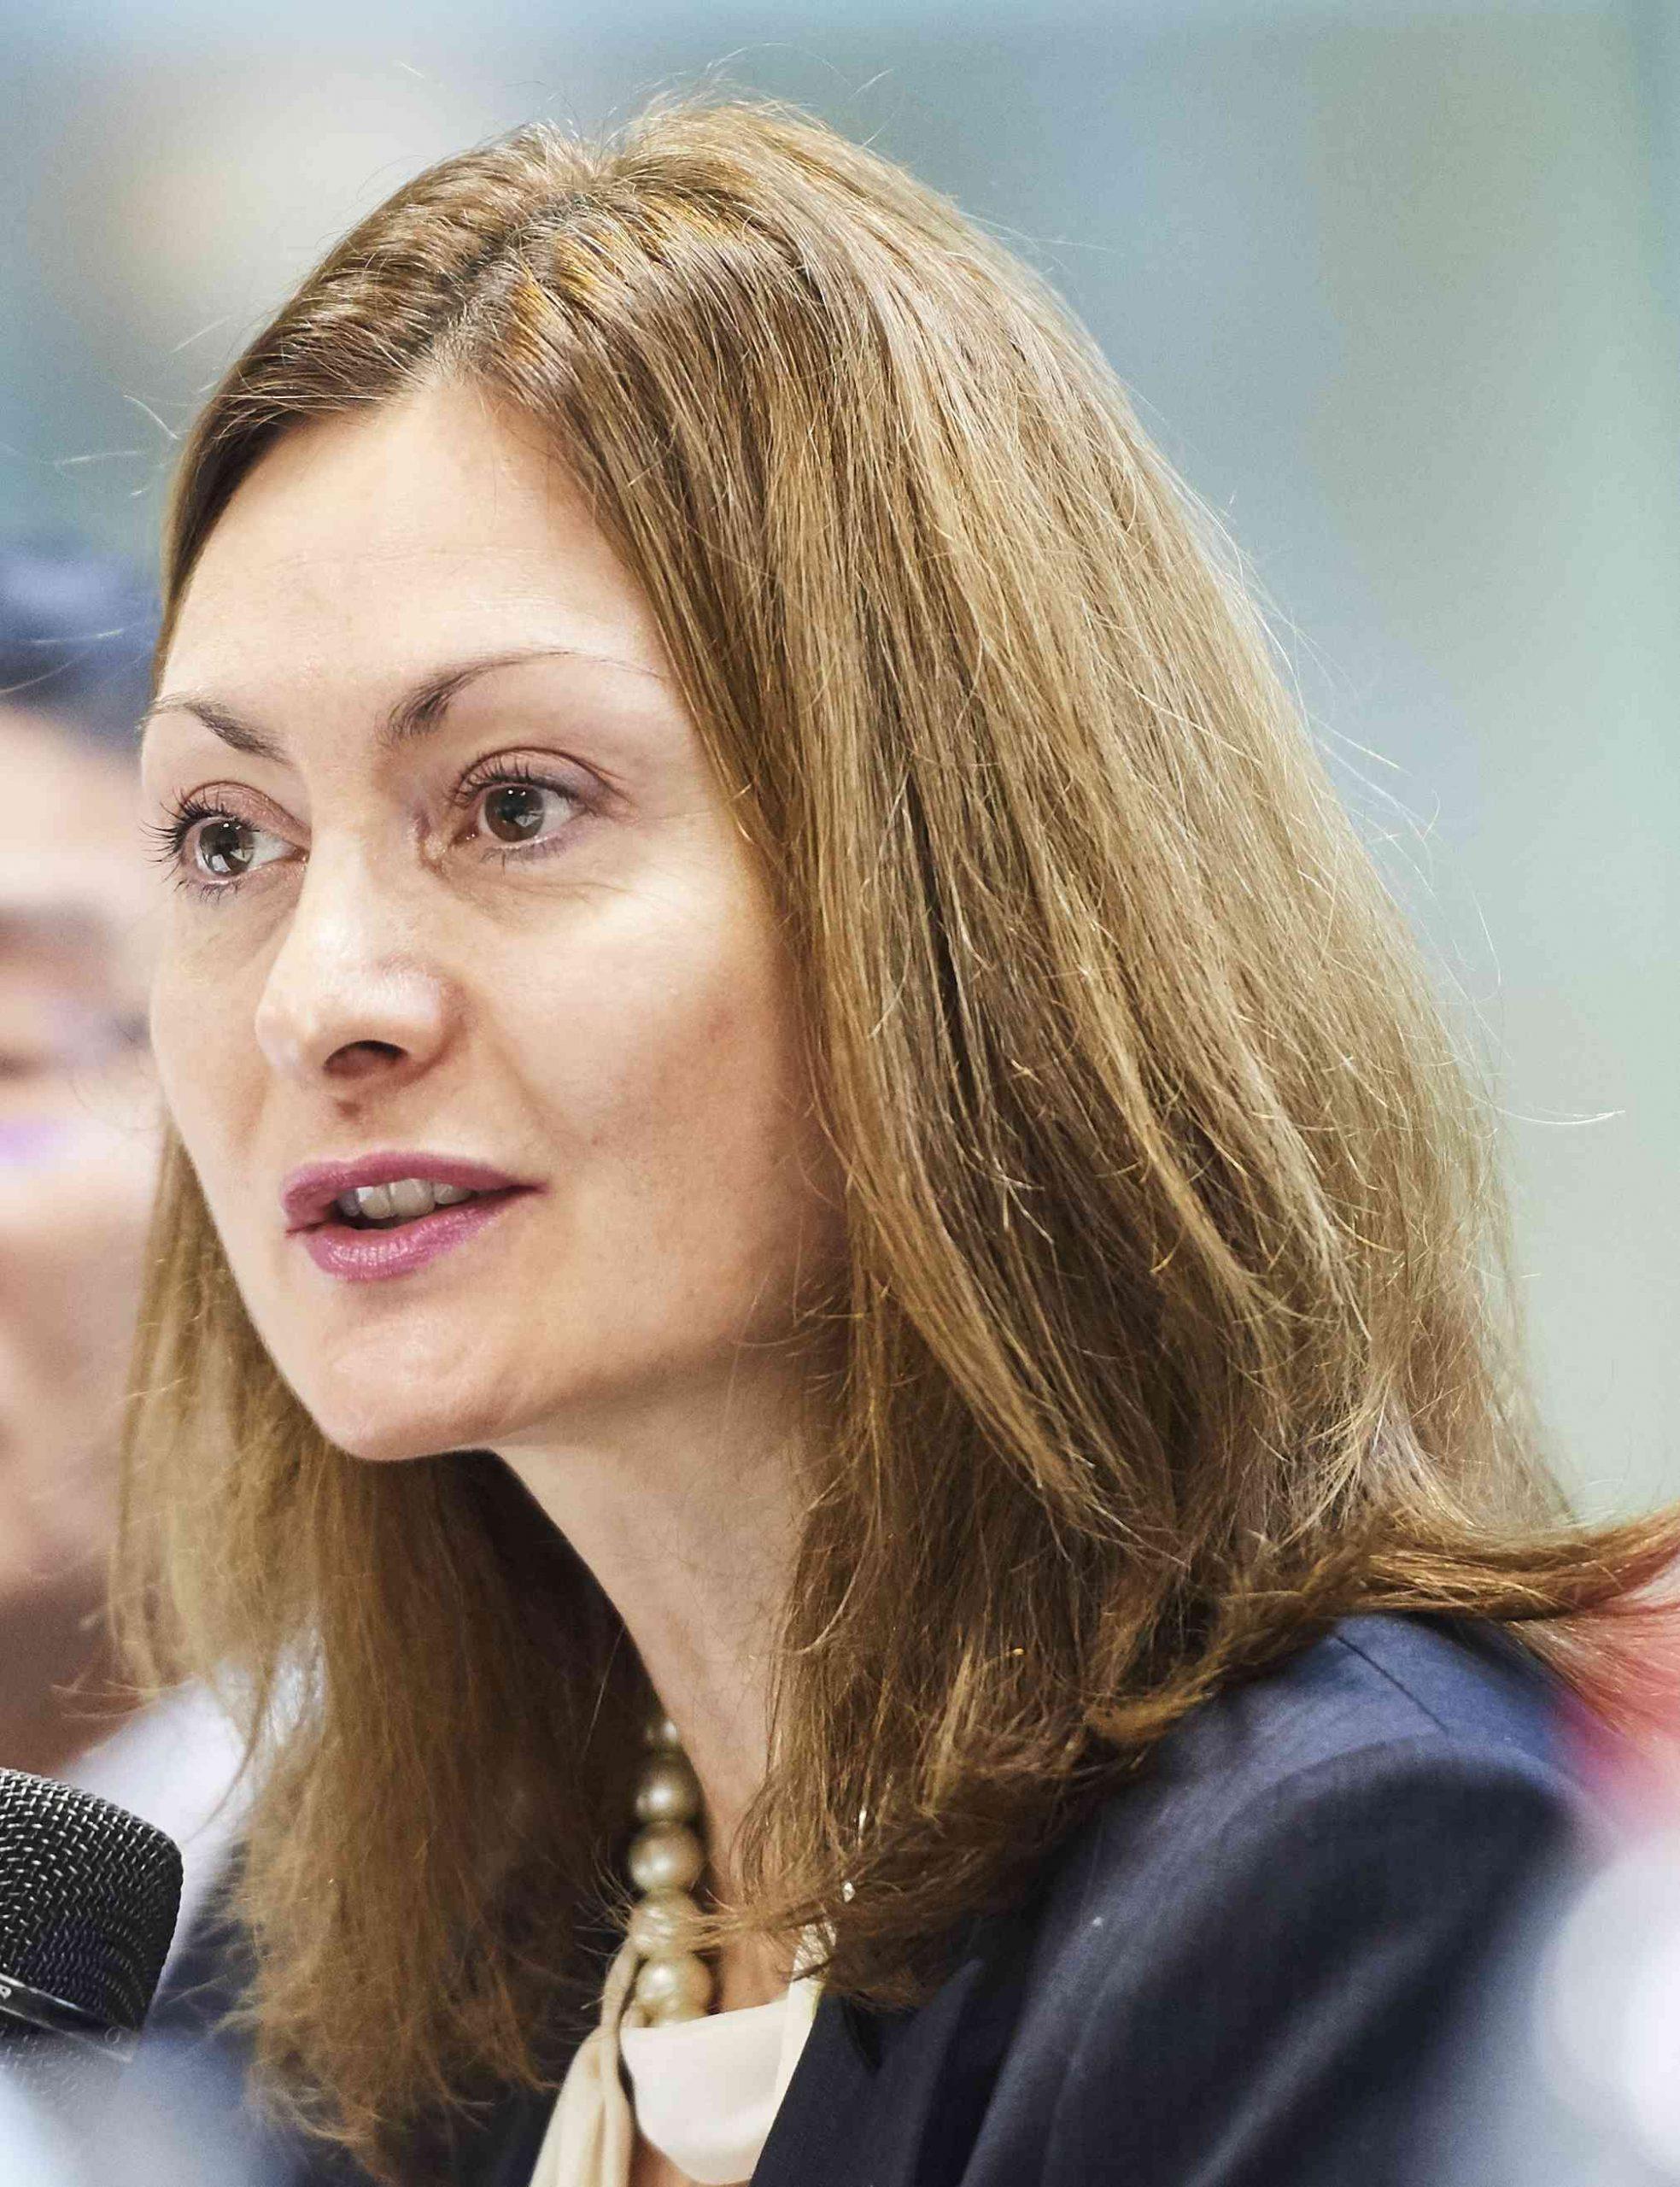 Dr. Anna Athanasopoulou